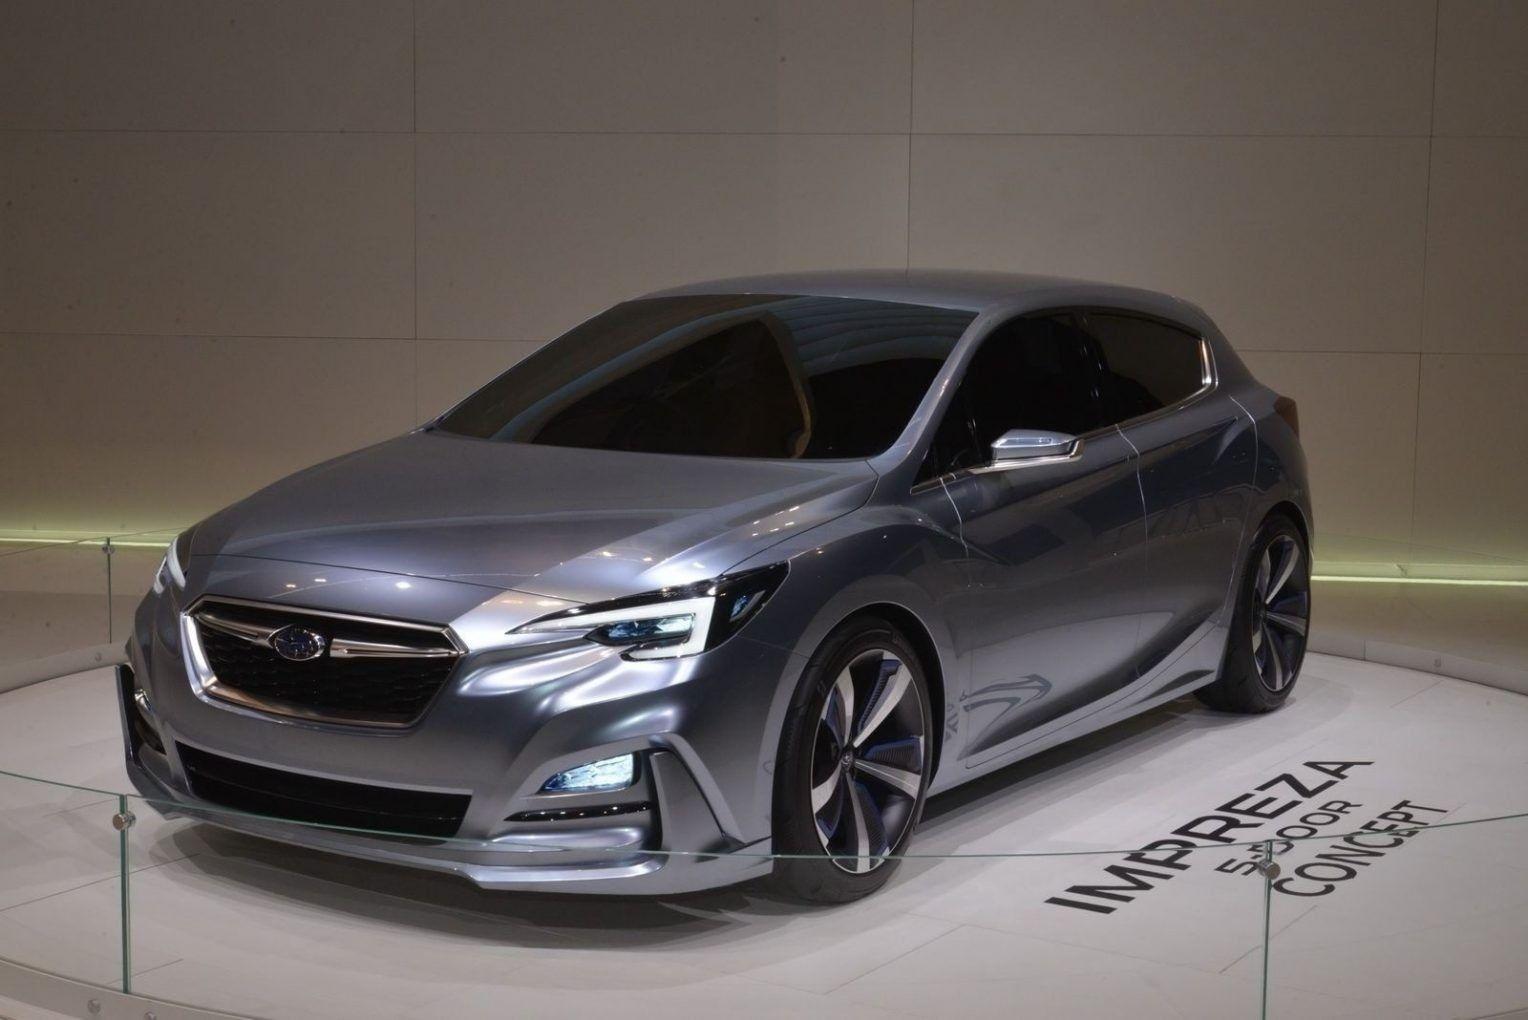 New 2019 Subaru Imprezas Price Subaru impreza sedan